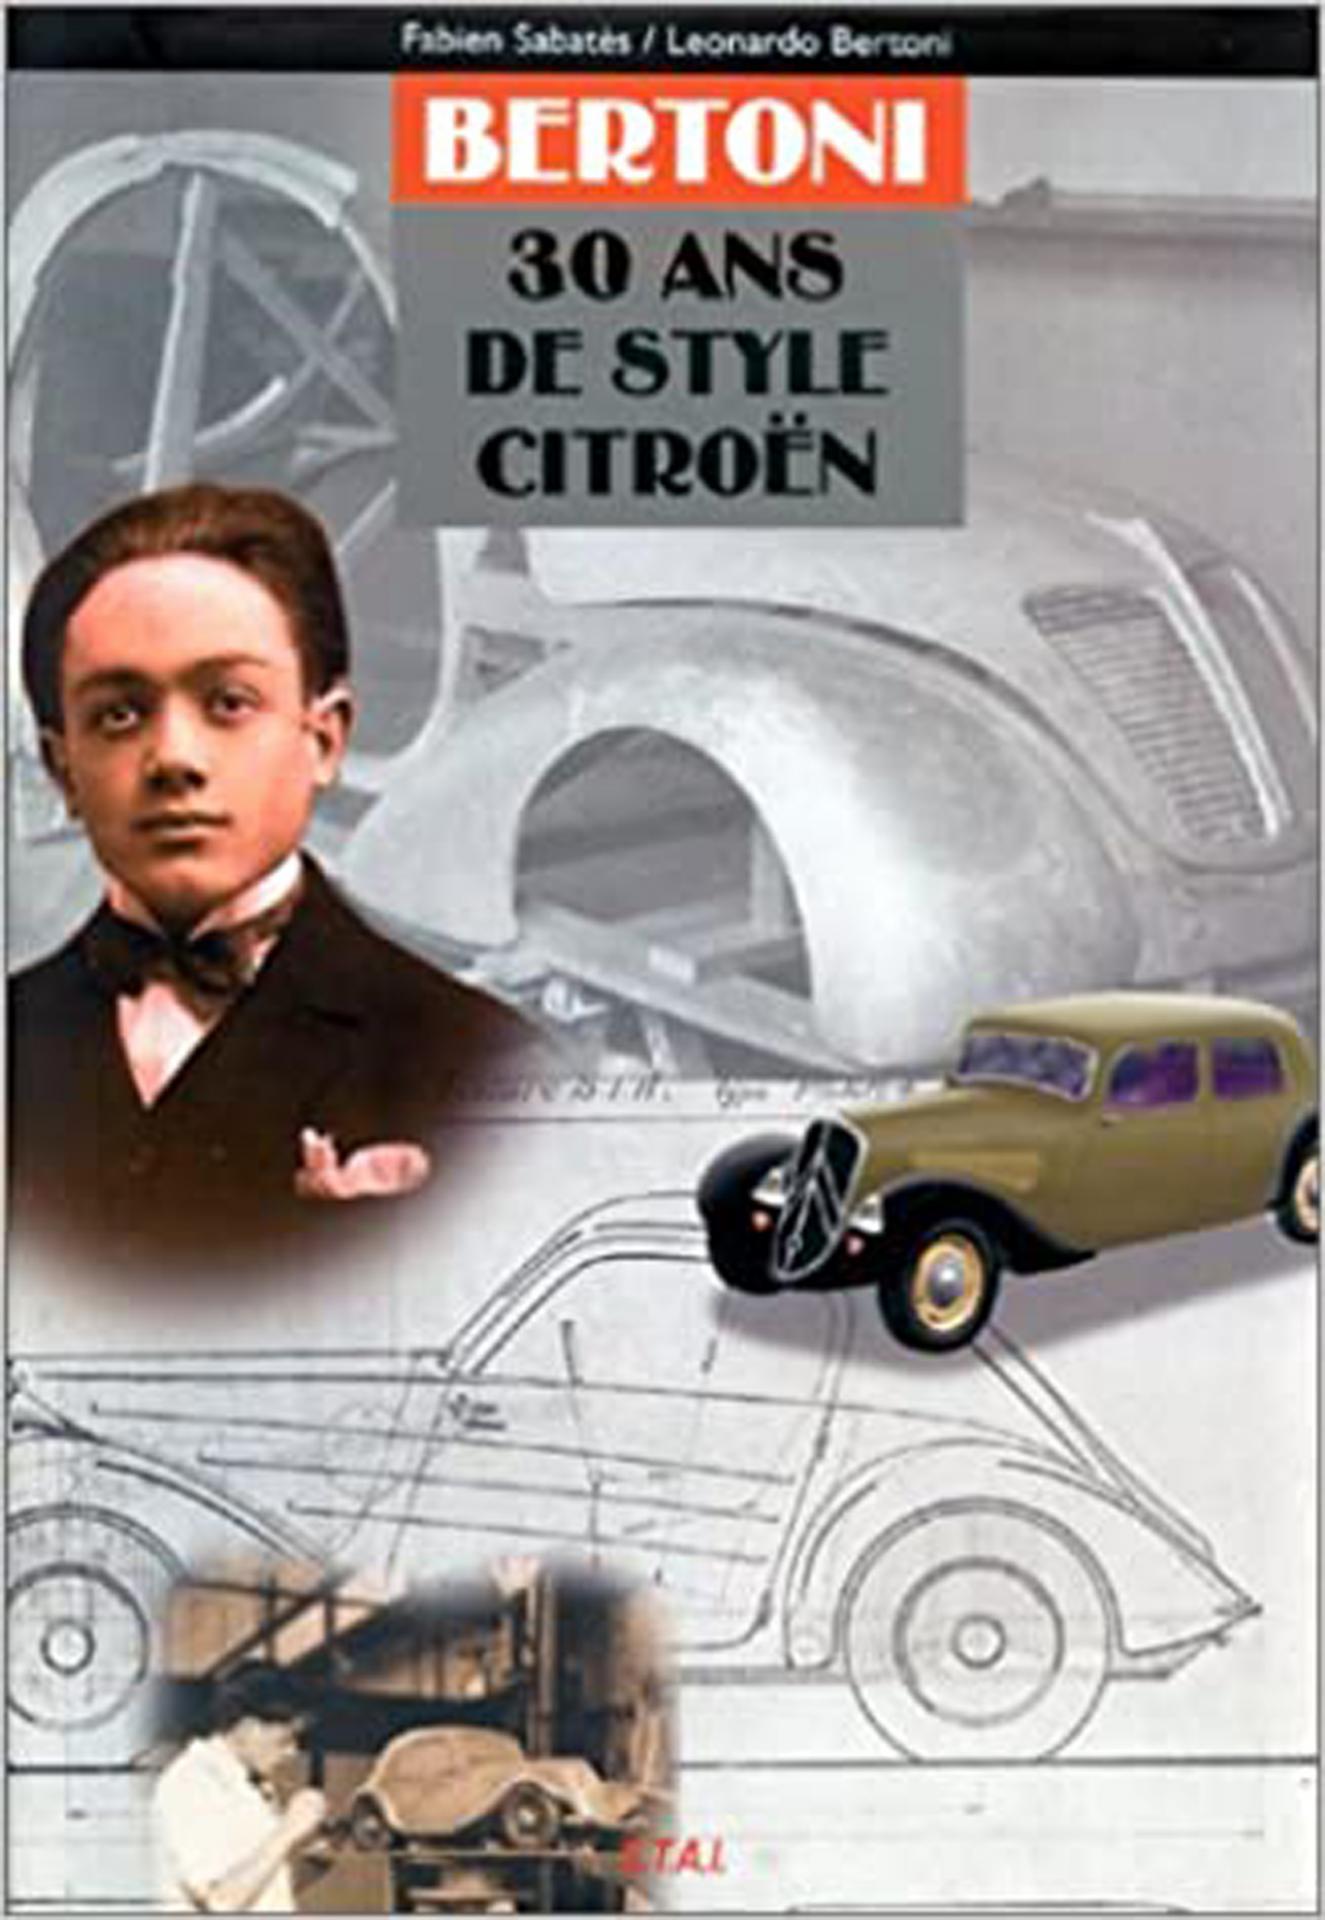 1998 Flaminio Bertoni 30 ans de style Citroën